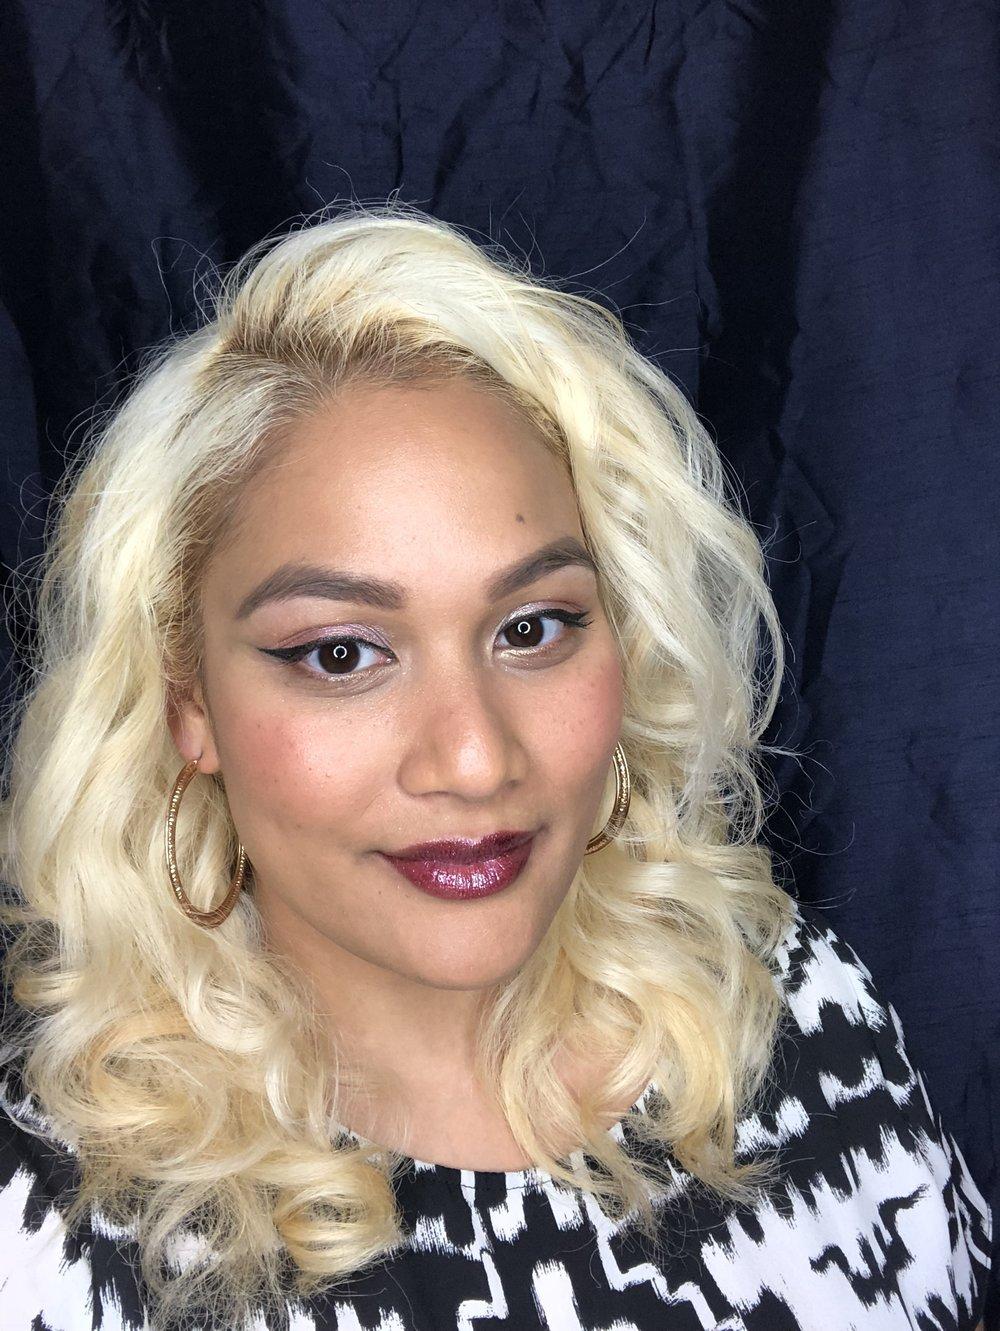 COSMIC GLOSS Lip Glitter in Astro-Naughty